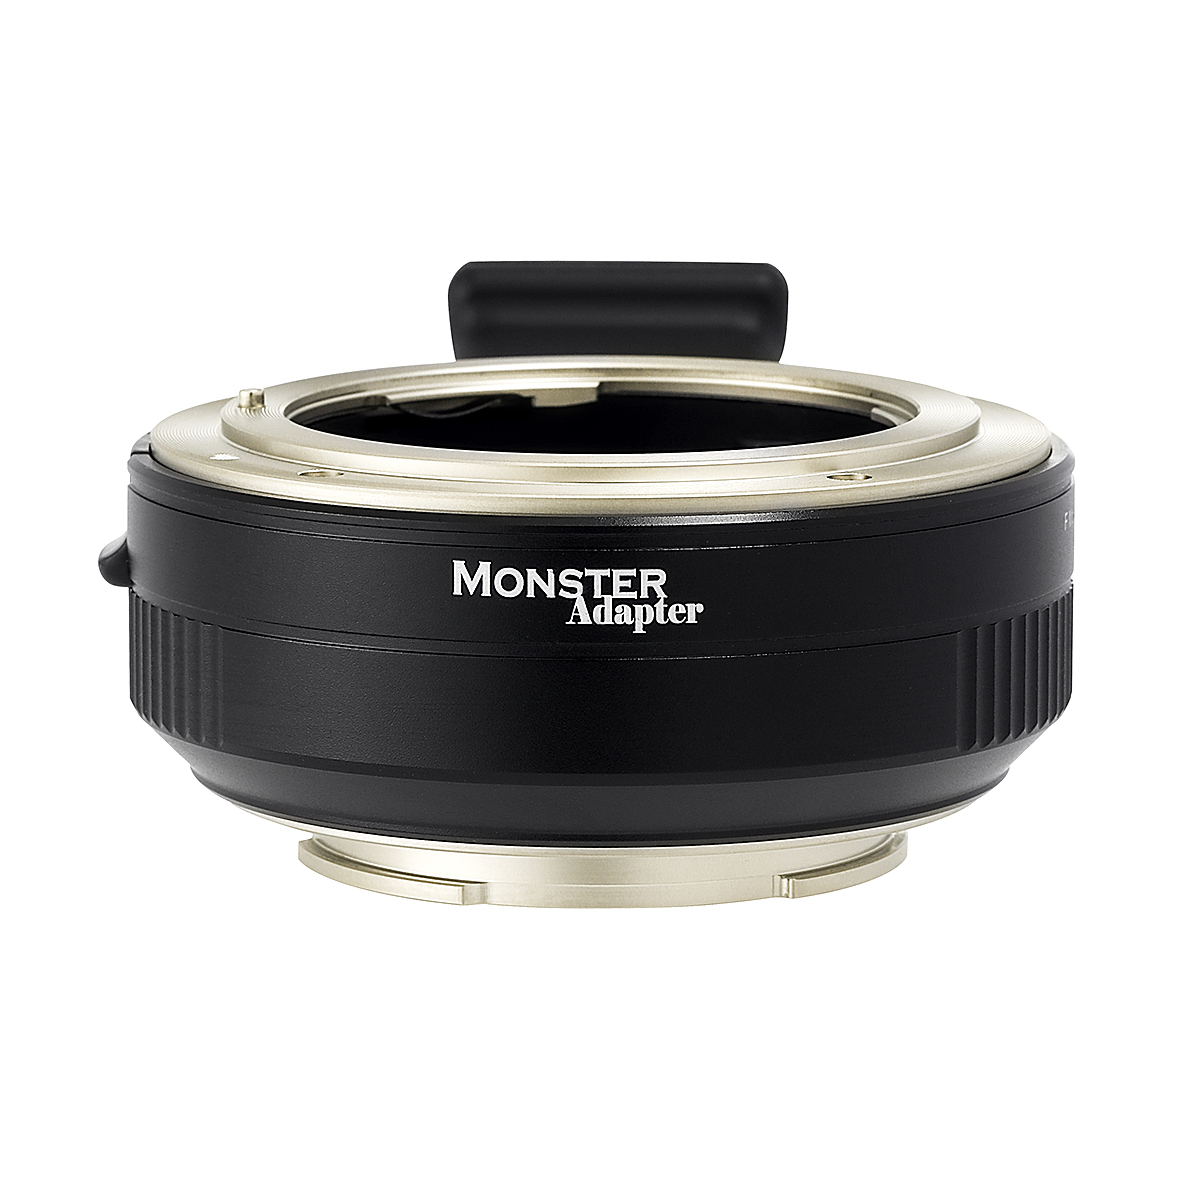 MonsterAdapter(モンスターアダプター)LA-FE1(ニコンFマウントレンズ → ソニーEマウント変換)電子マウントアダプター AE/AF撮影可能